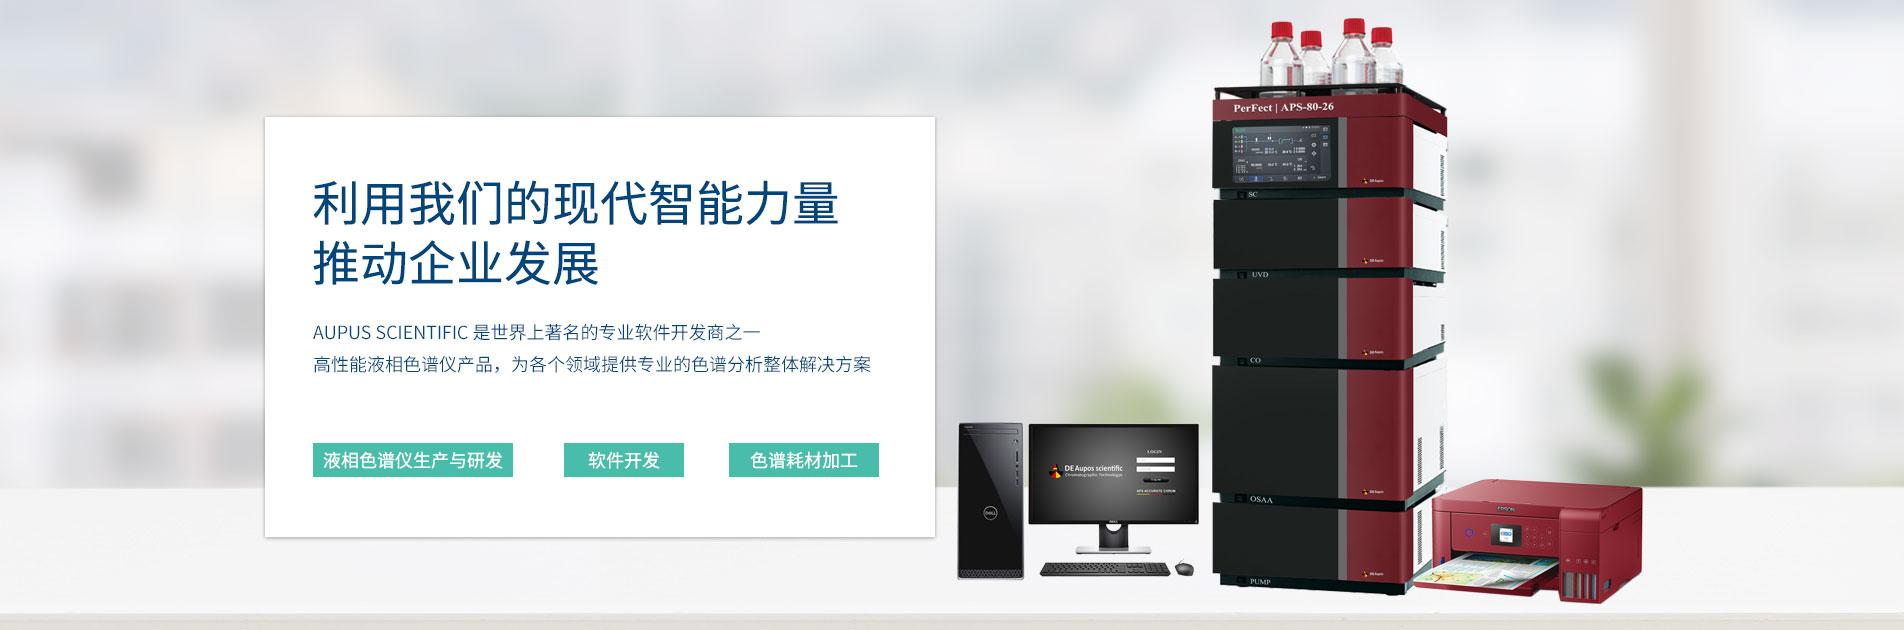 Luxury-APS-8036高效液相色谱仪